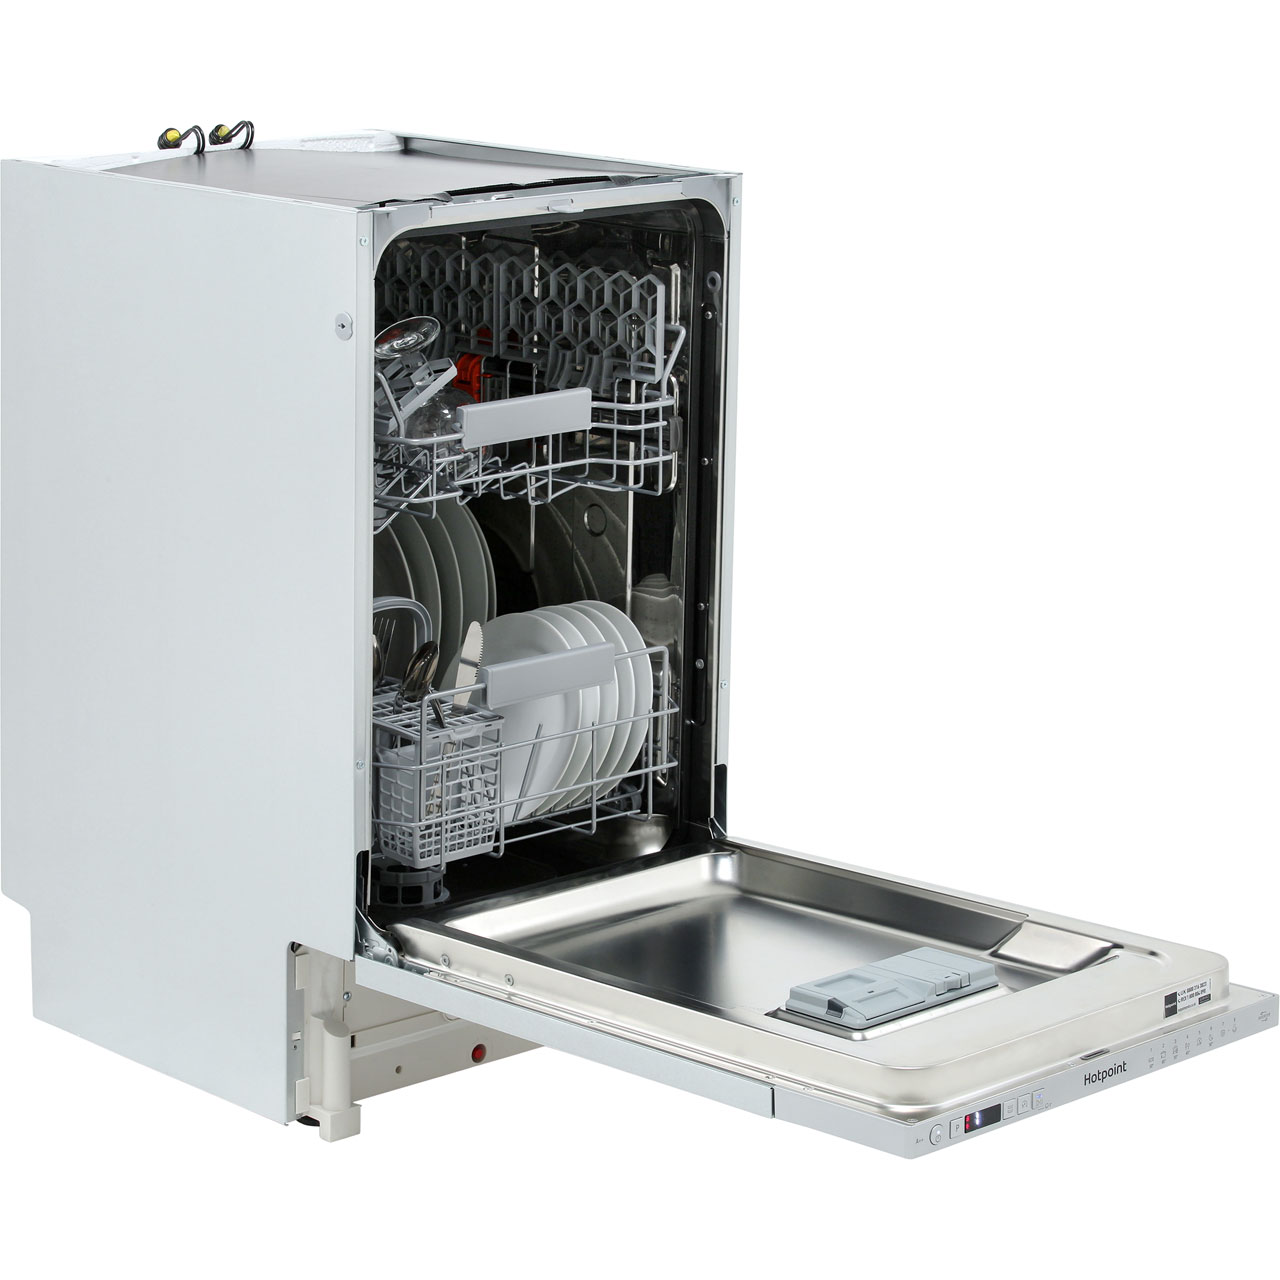 built in dishwasher reviews uk